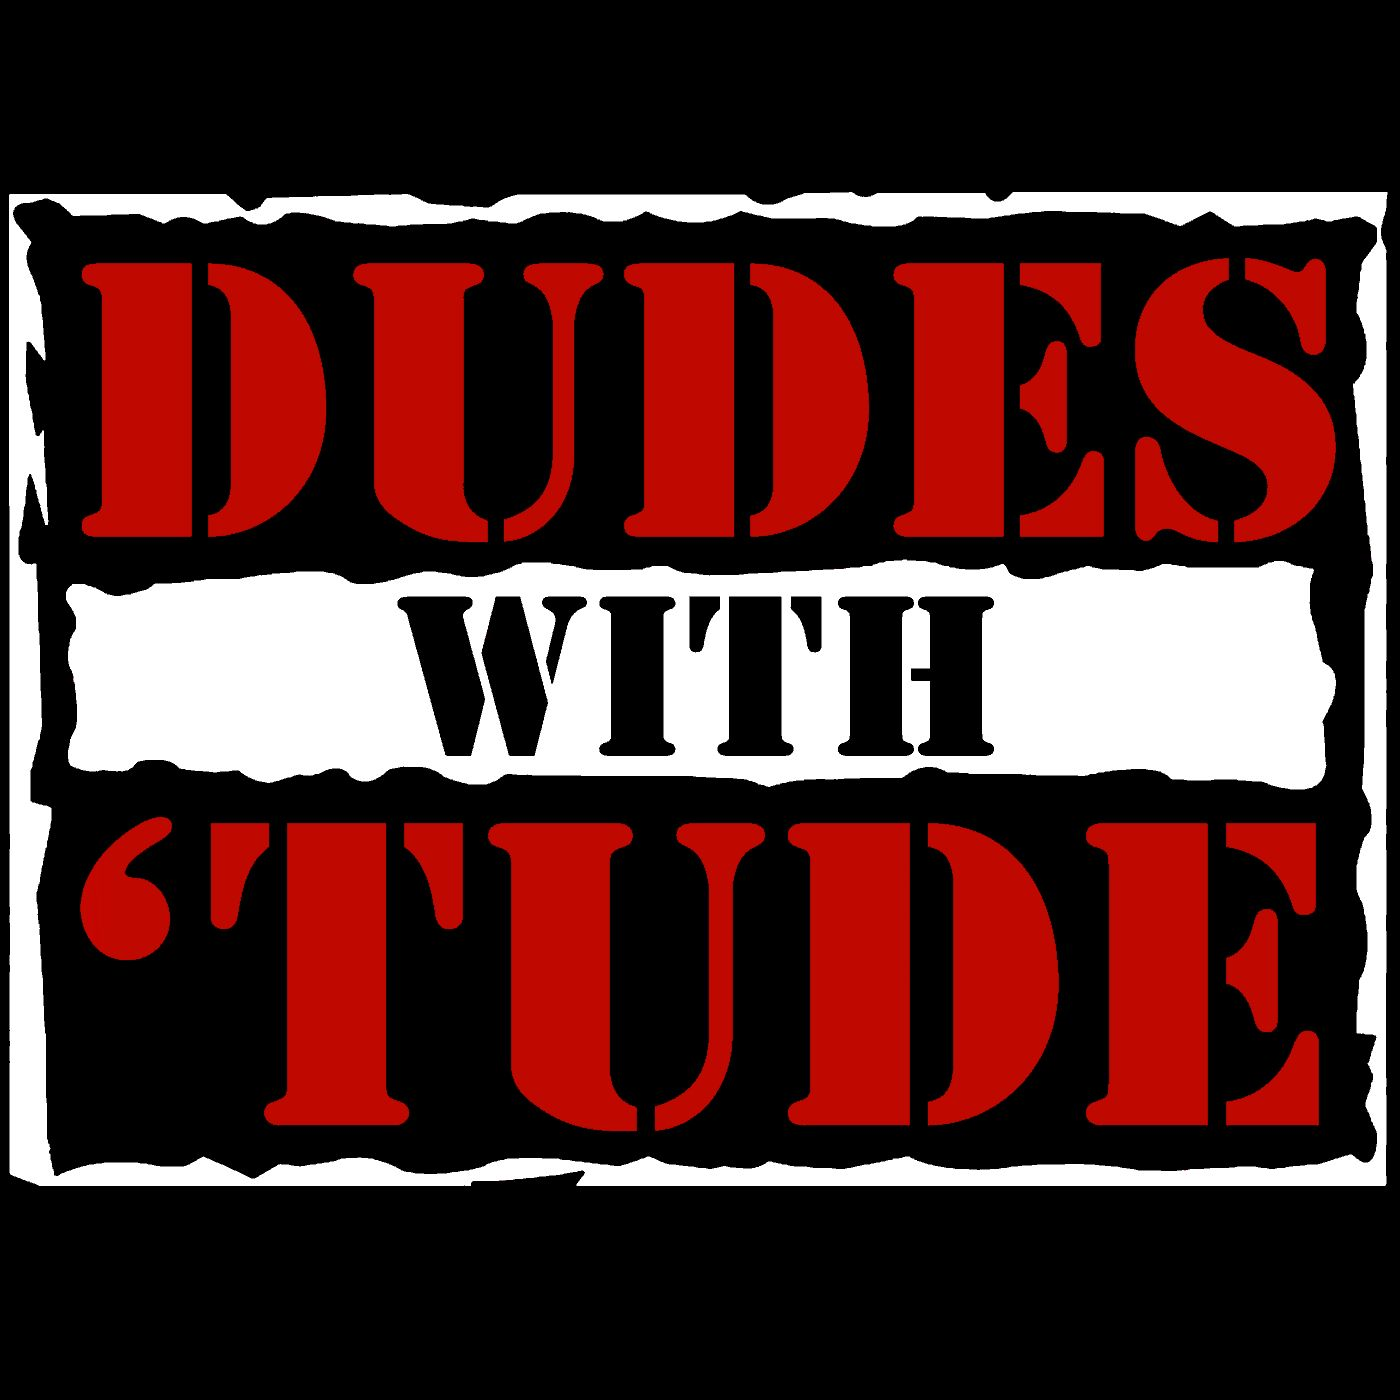 Dudes With Attitudes